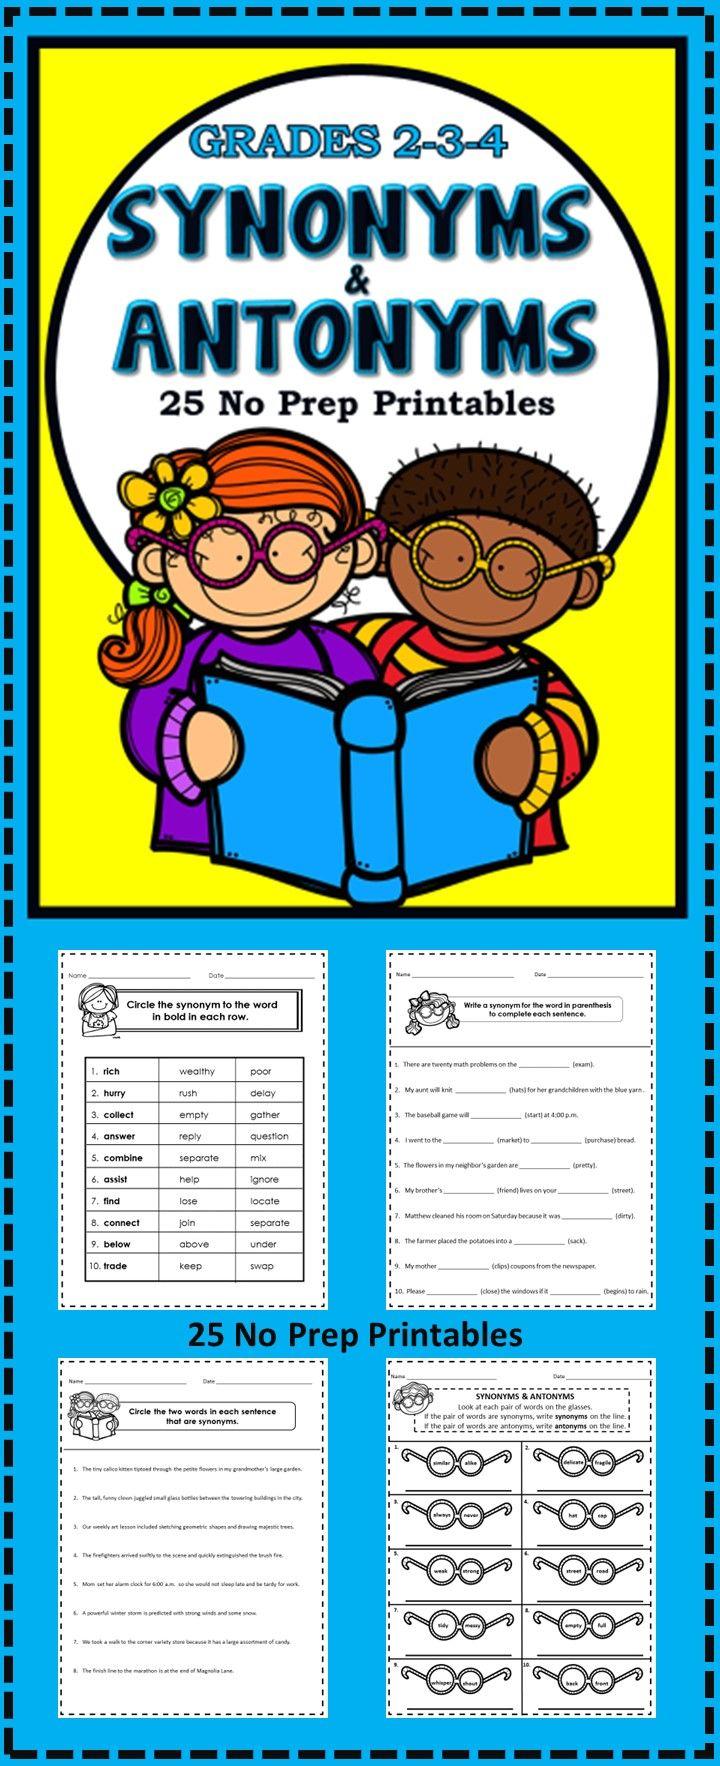 Synonyms And Antonyms No Prep Printables Grades 2 3 4 Synonyms And Antonyms Elementary Lesson Antonyms